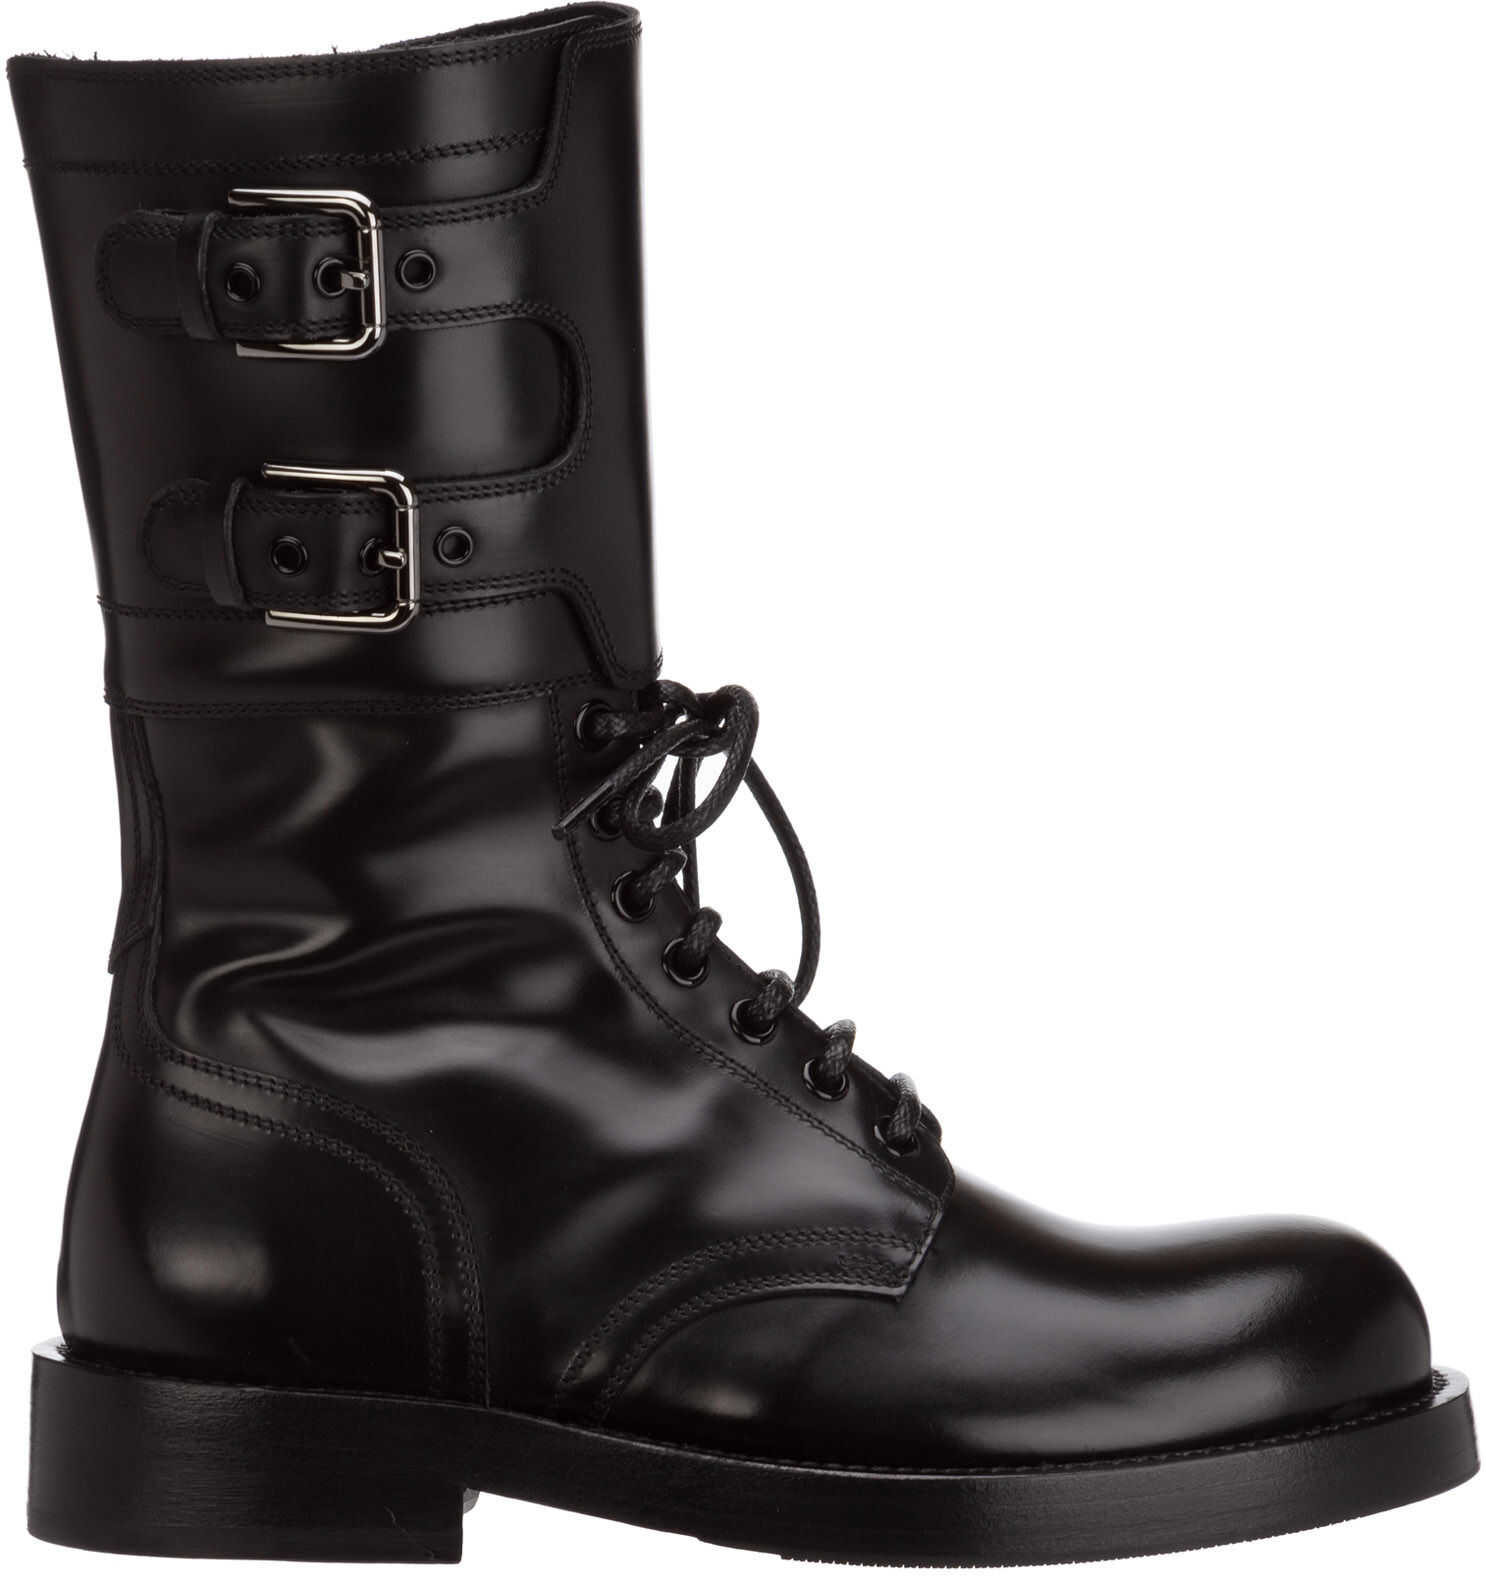 Dolce & Gabbana Boots Booties CT0710AC80180999 Black imagine b-mall.ro